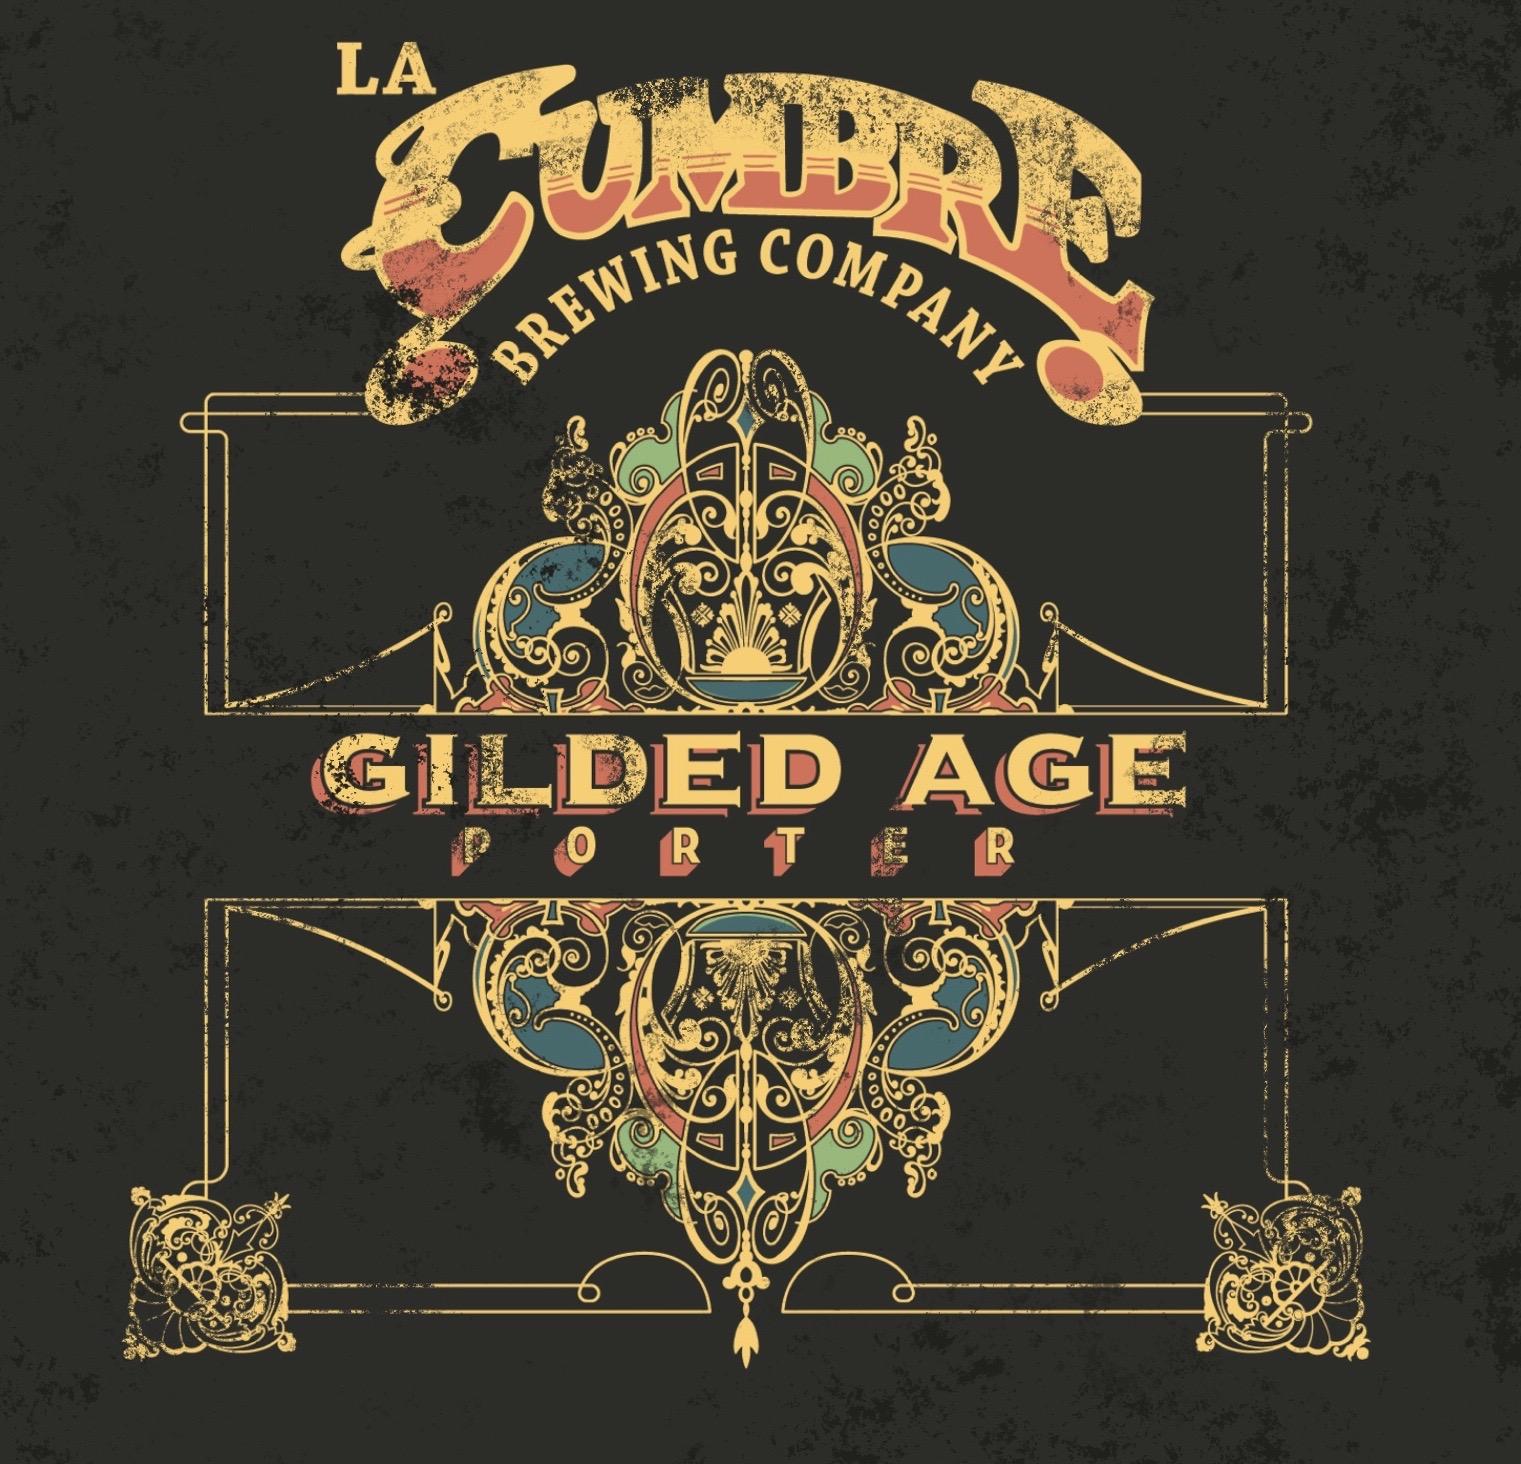 Gilded Age Porter